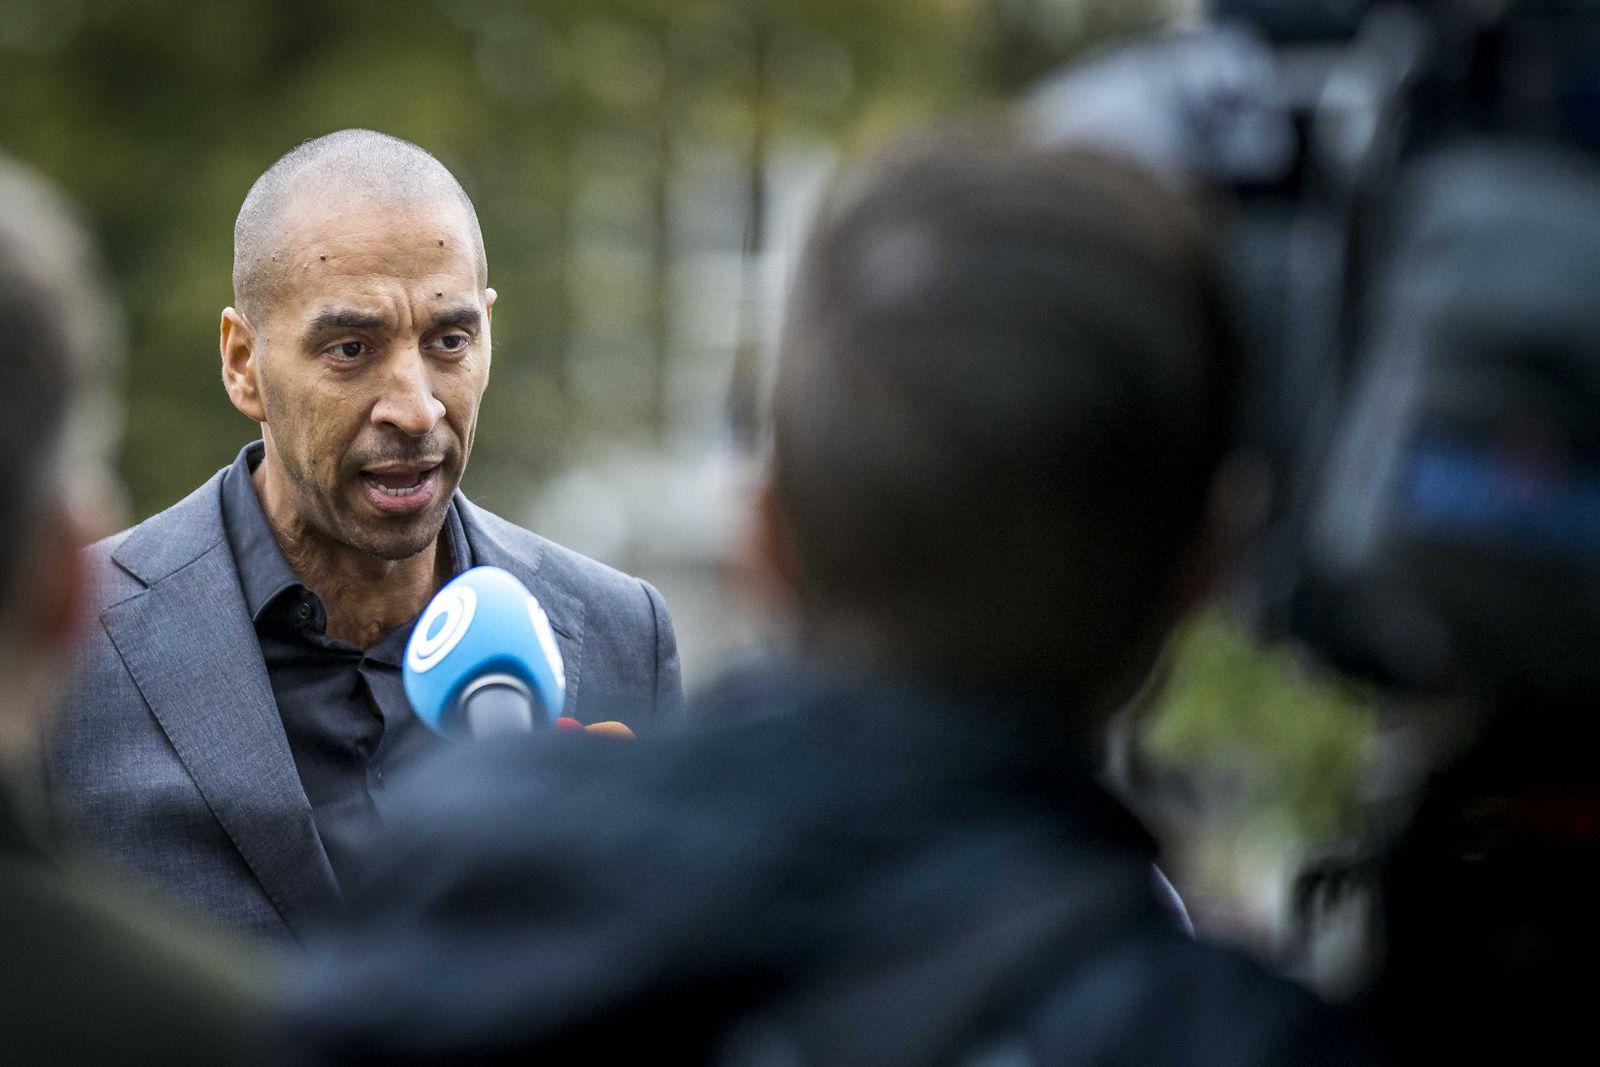 Nickz Verstappen case trial, Maastricht, Netherlands - 28 Sep 2020